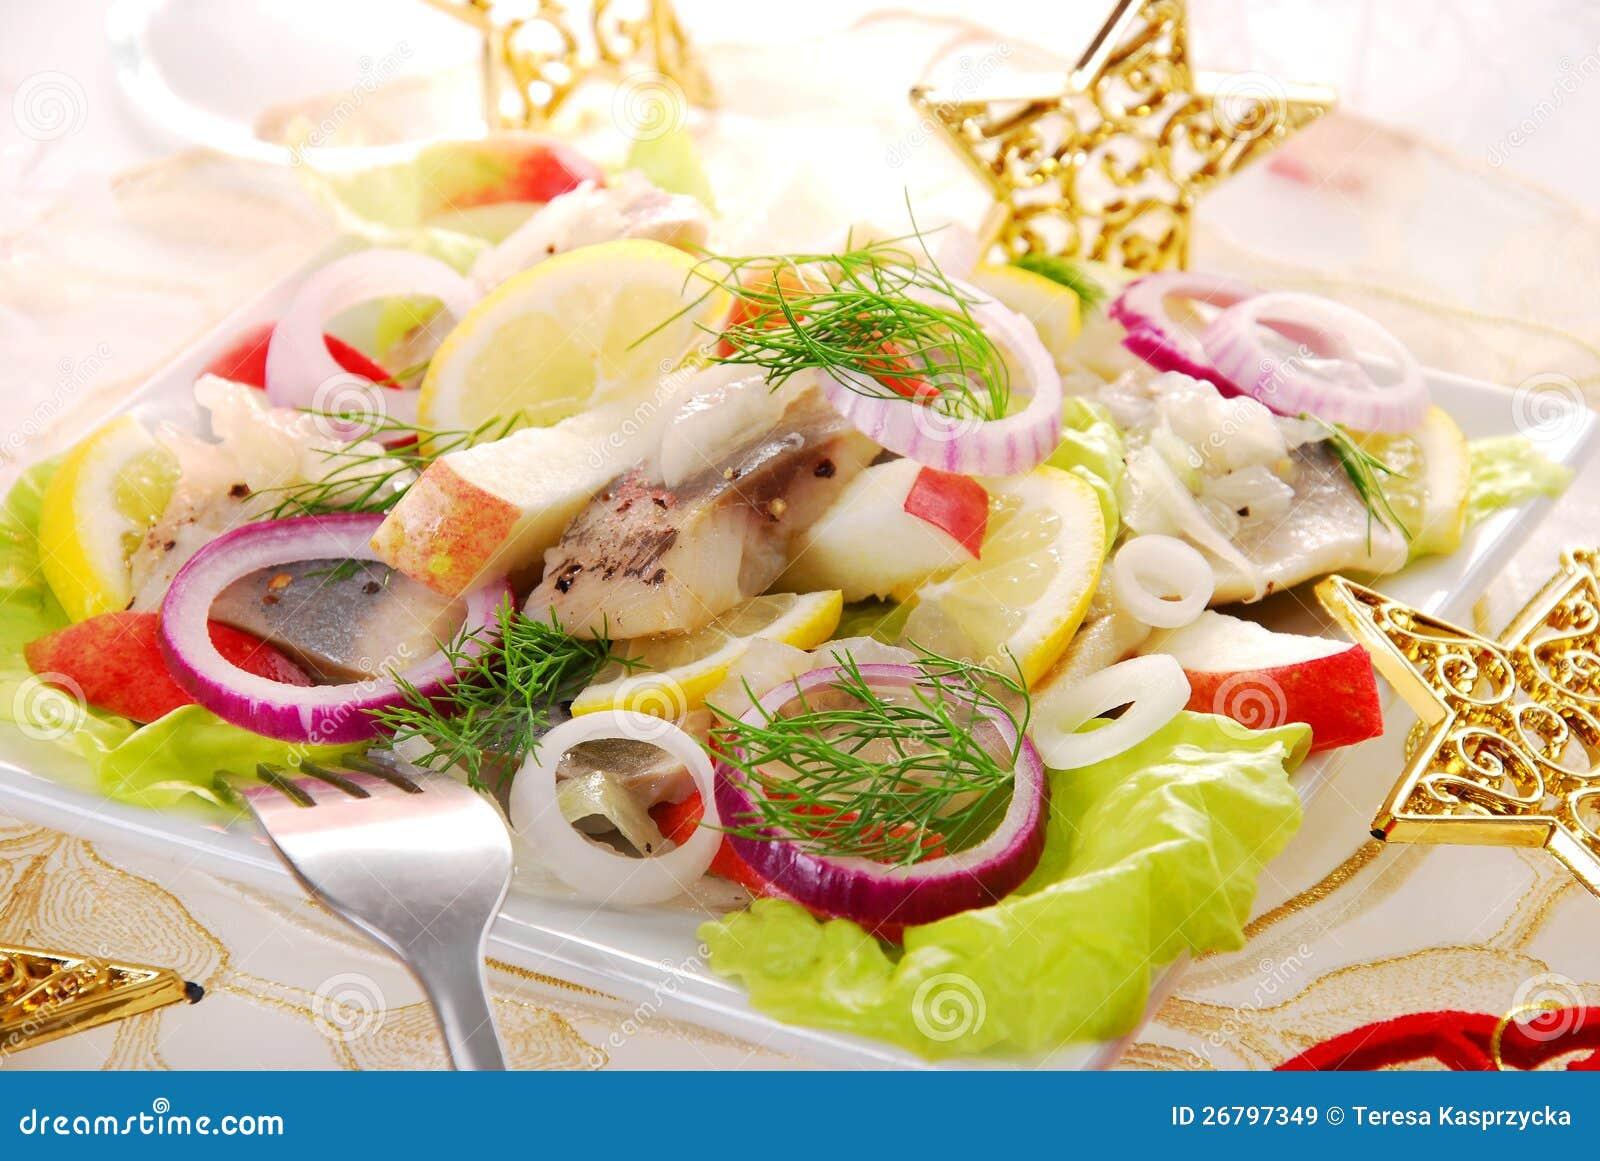 Herring salad with apple